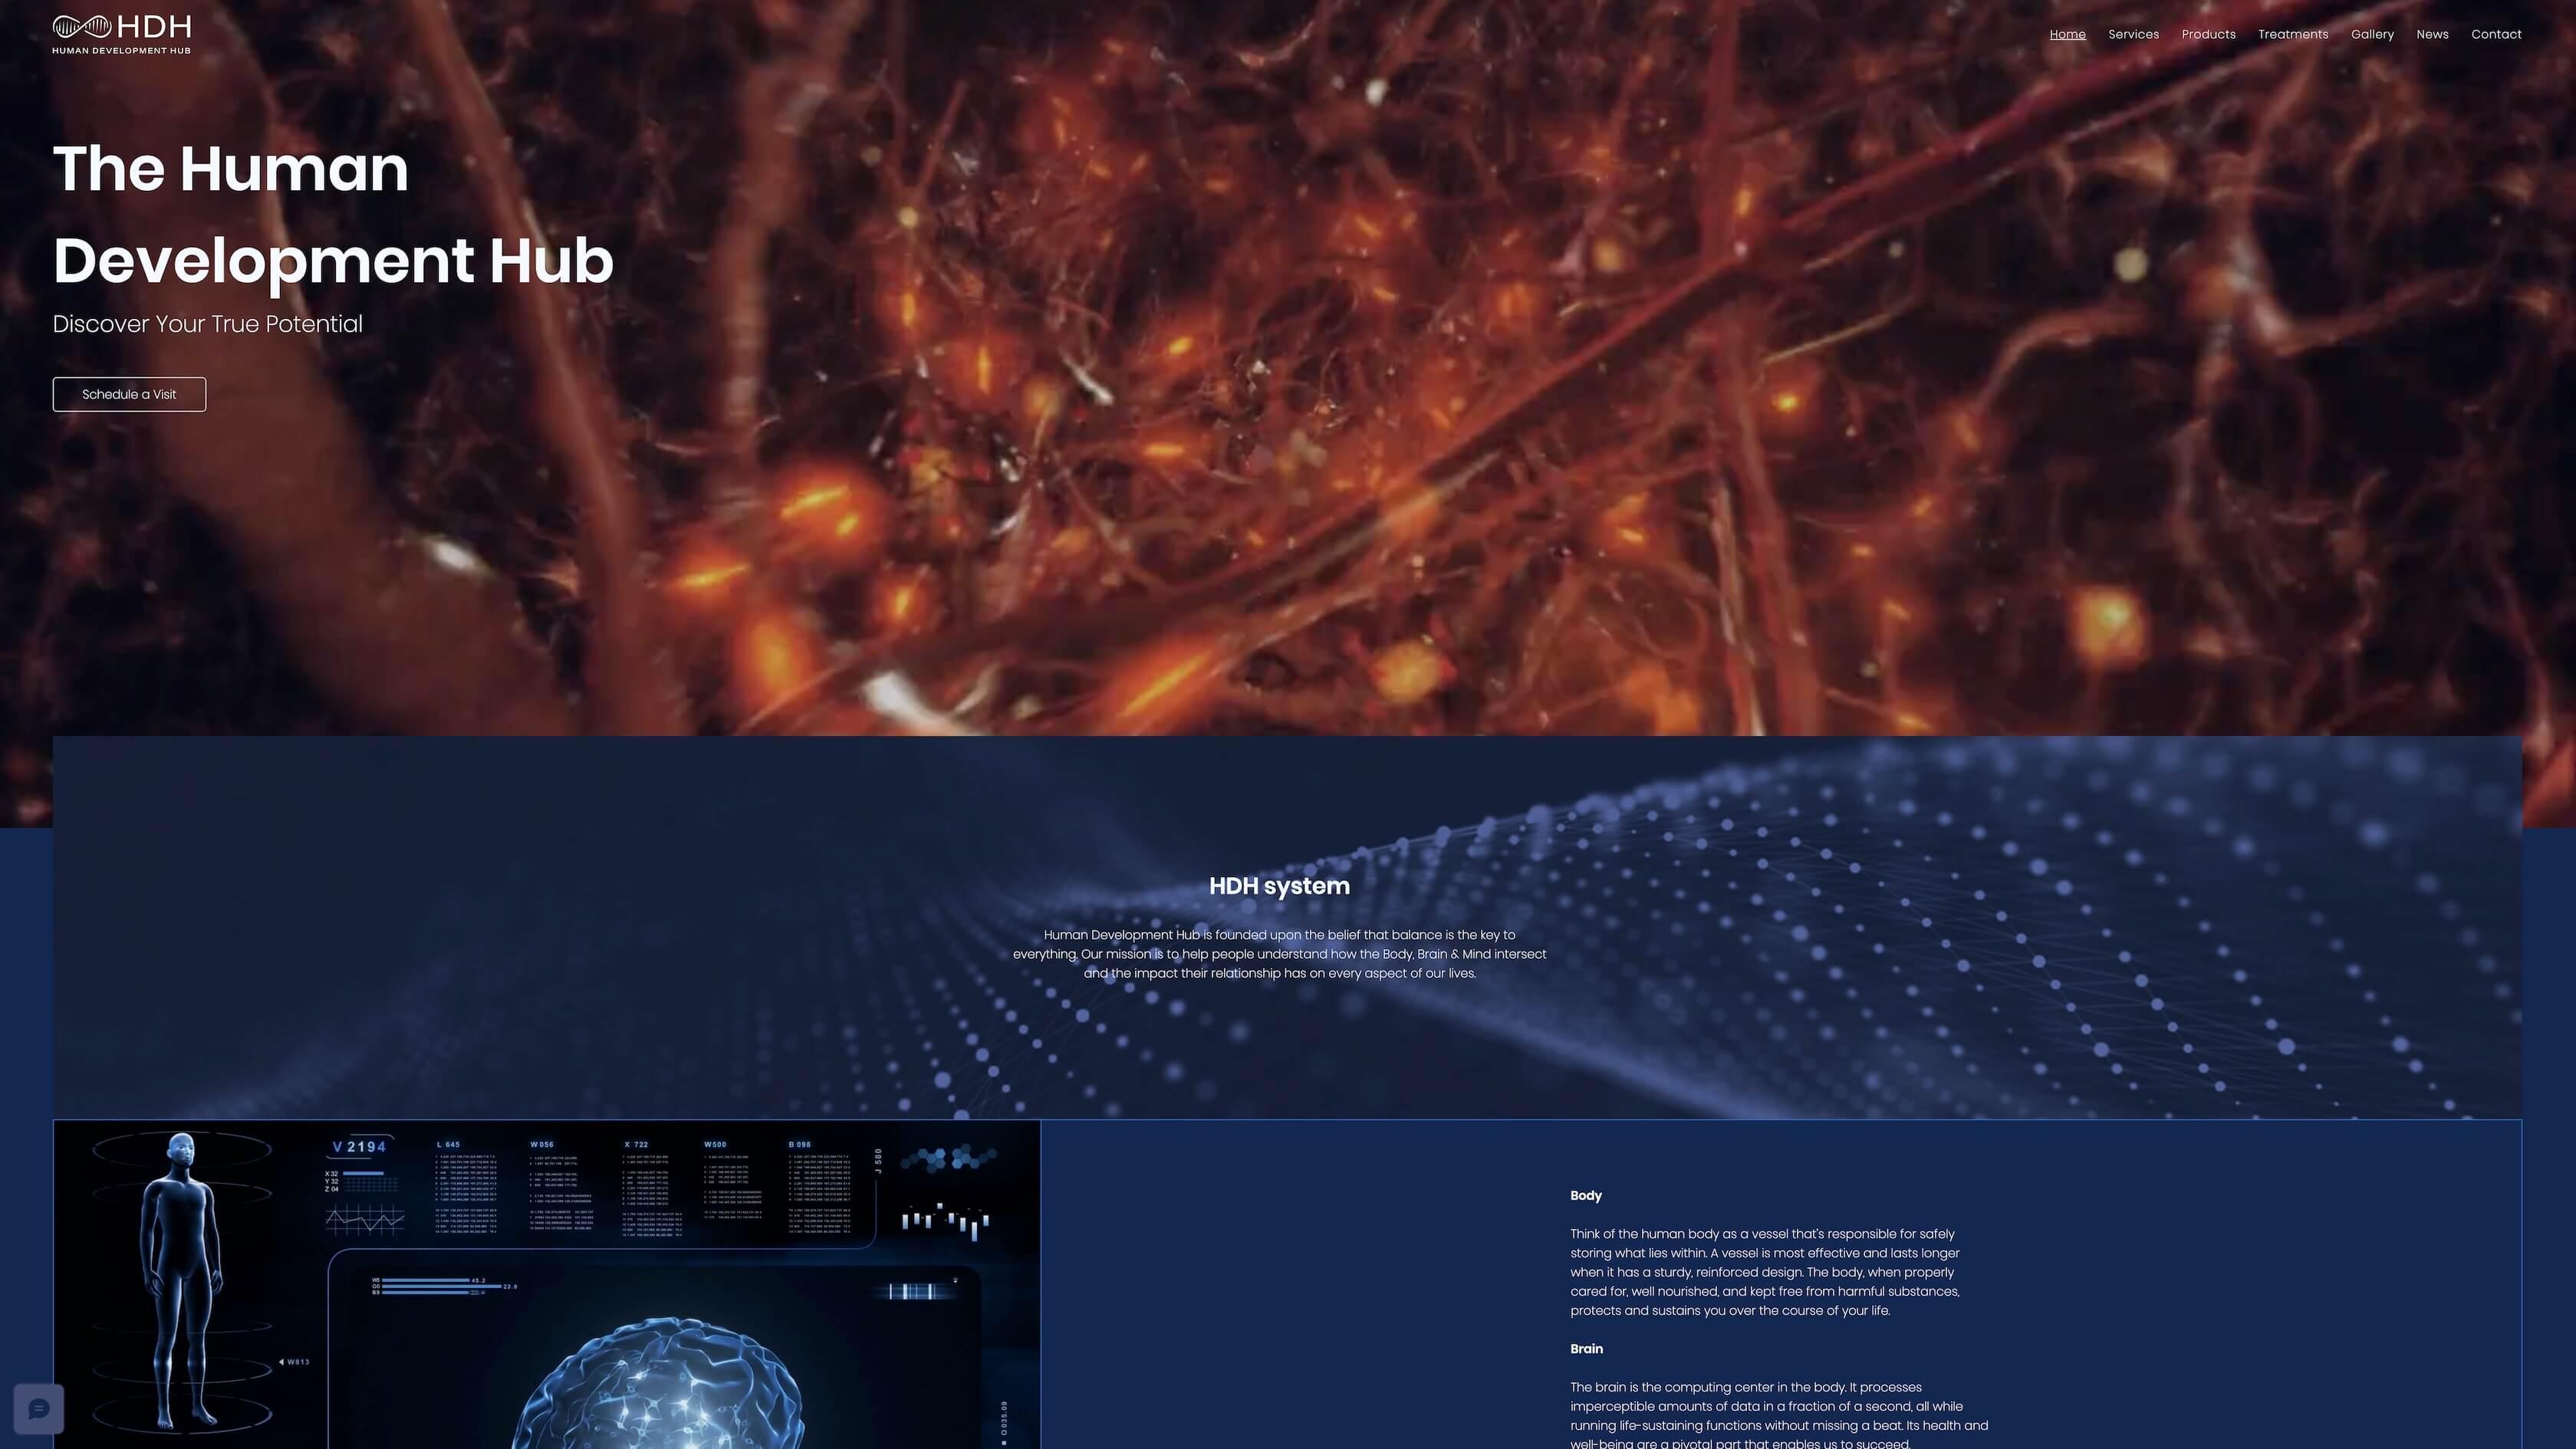 HUMAN DEVELOPMENT HUB - SINGAPORE DNA research facility site, Blog, IG, pro logo, co...